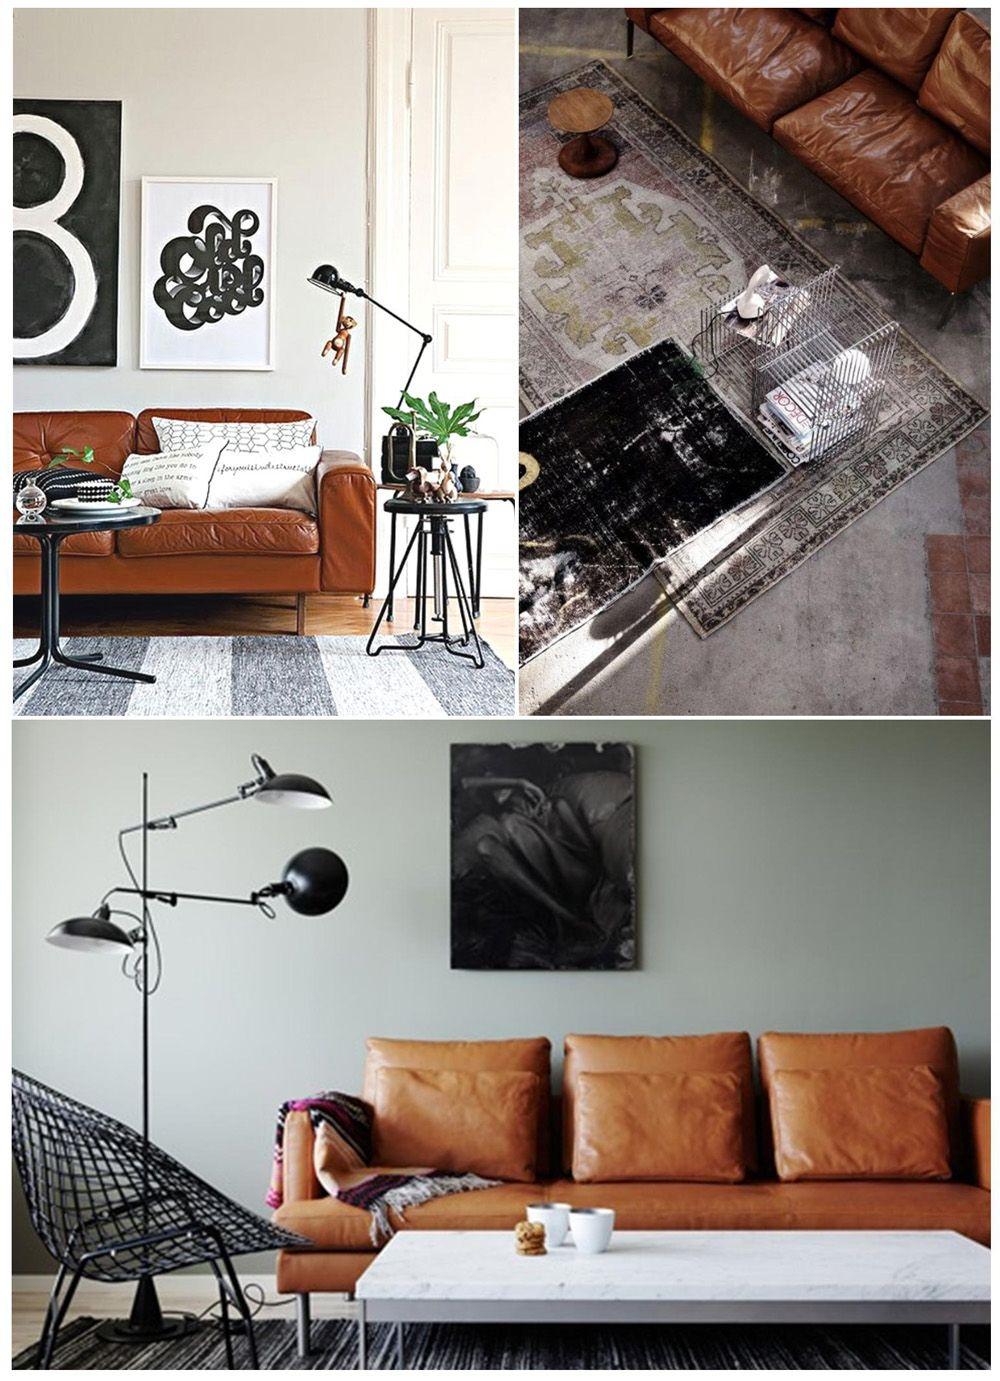 couch, sofa, lounge: leder in karamell, honig, cognac | h0use ... - Wohnzimmer Ledersofa Braun